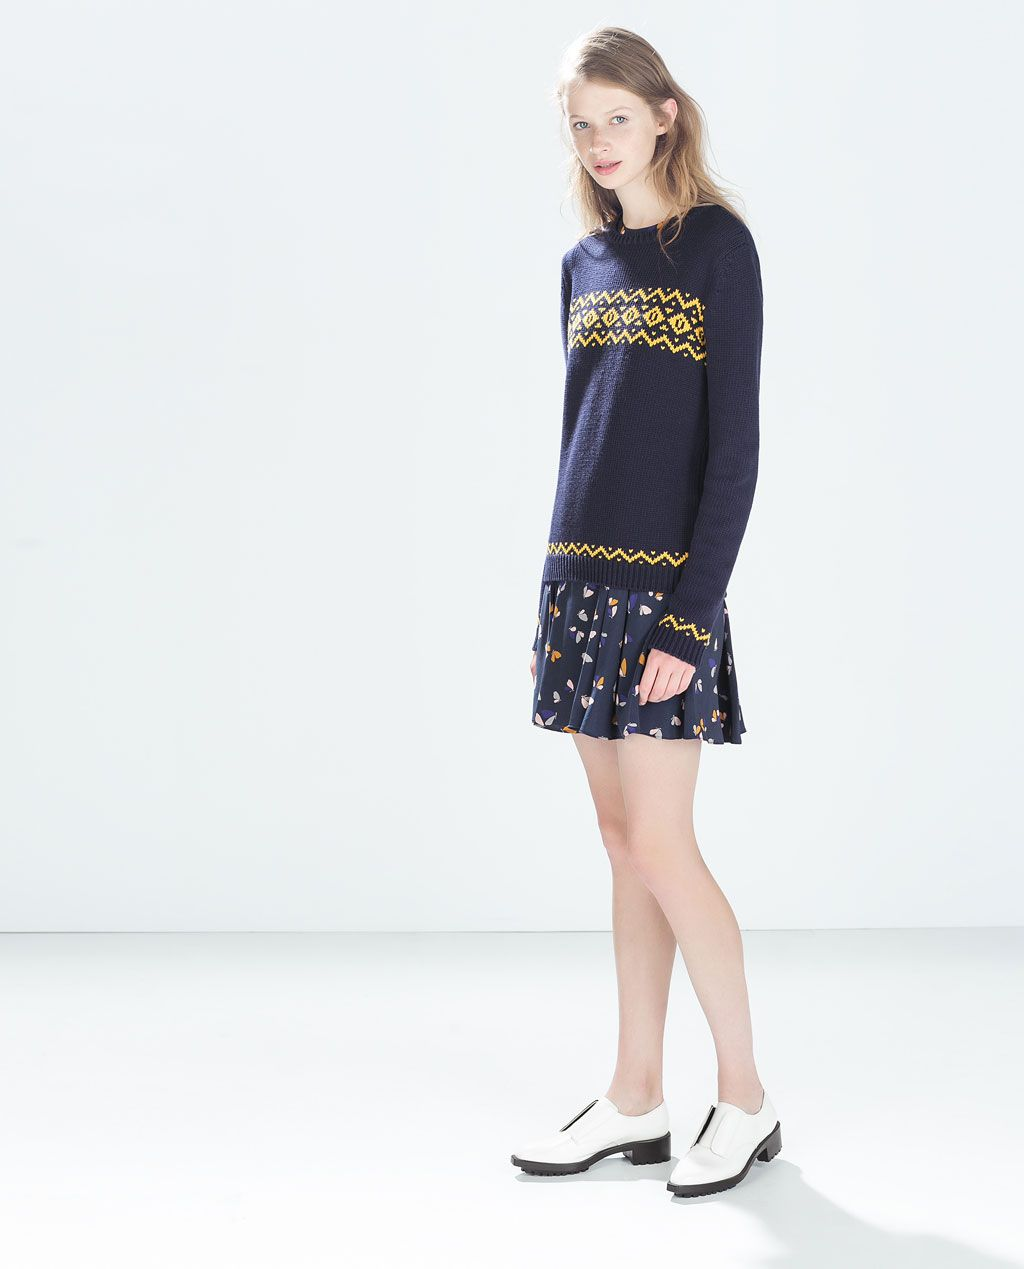 ZARA - MUJER - VESTIDO ESTAMPADO VUELO | fashion | Pinterest | Zara ...